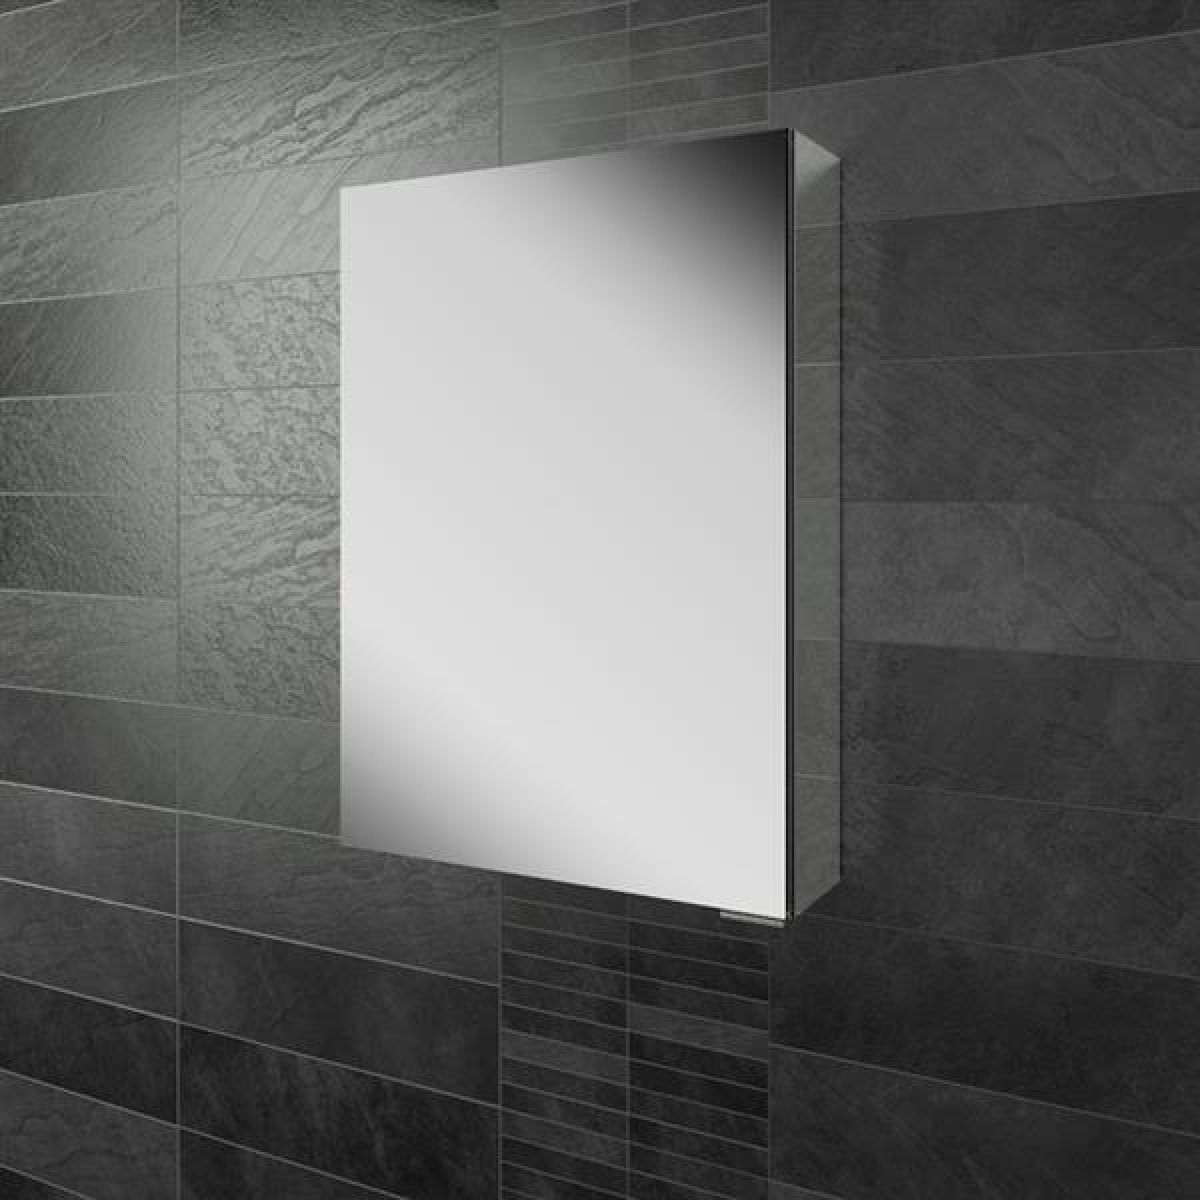 HiB Eris 50 Single Door Mirrored Cabinet